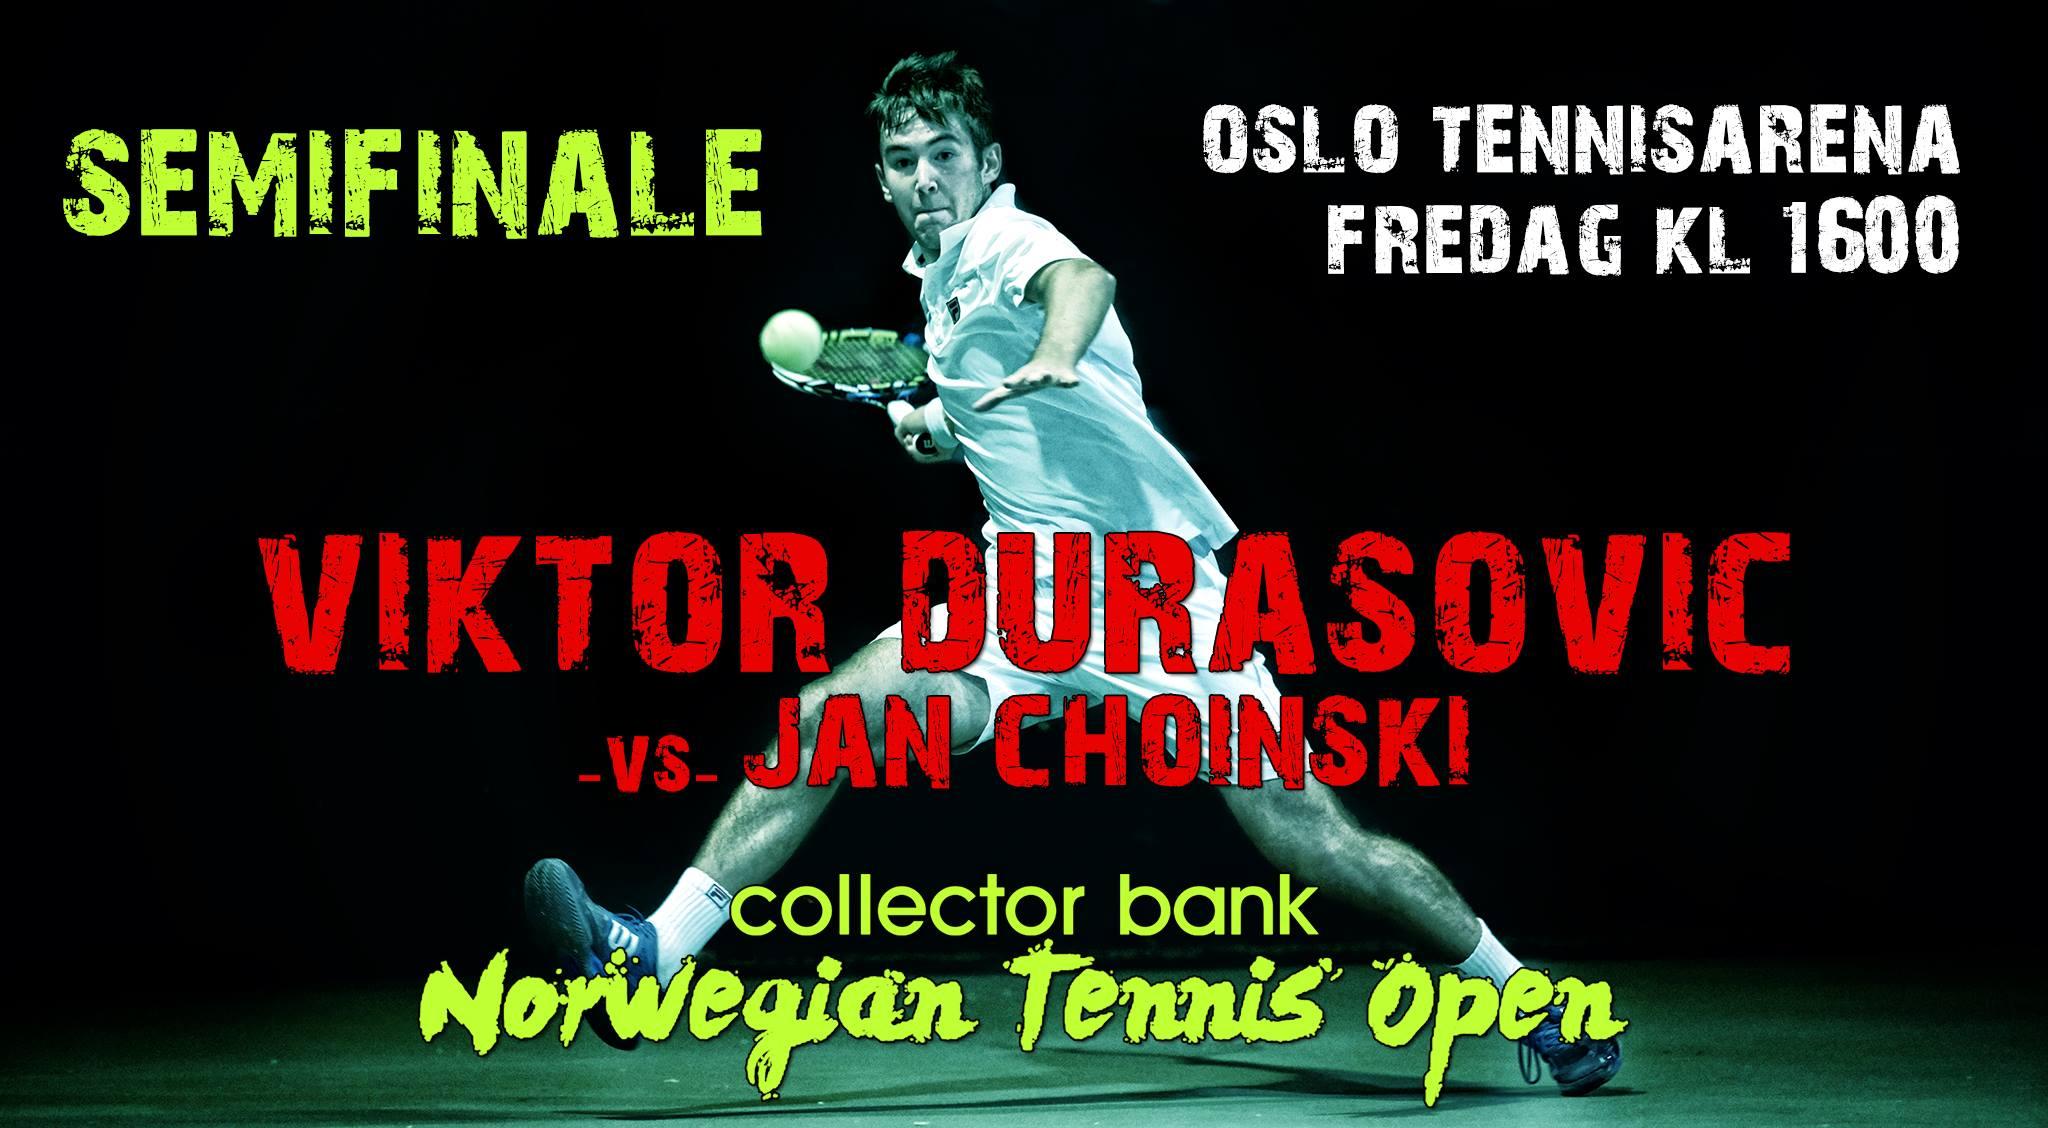 Halloween Semifinal with Durasovic at OTA